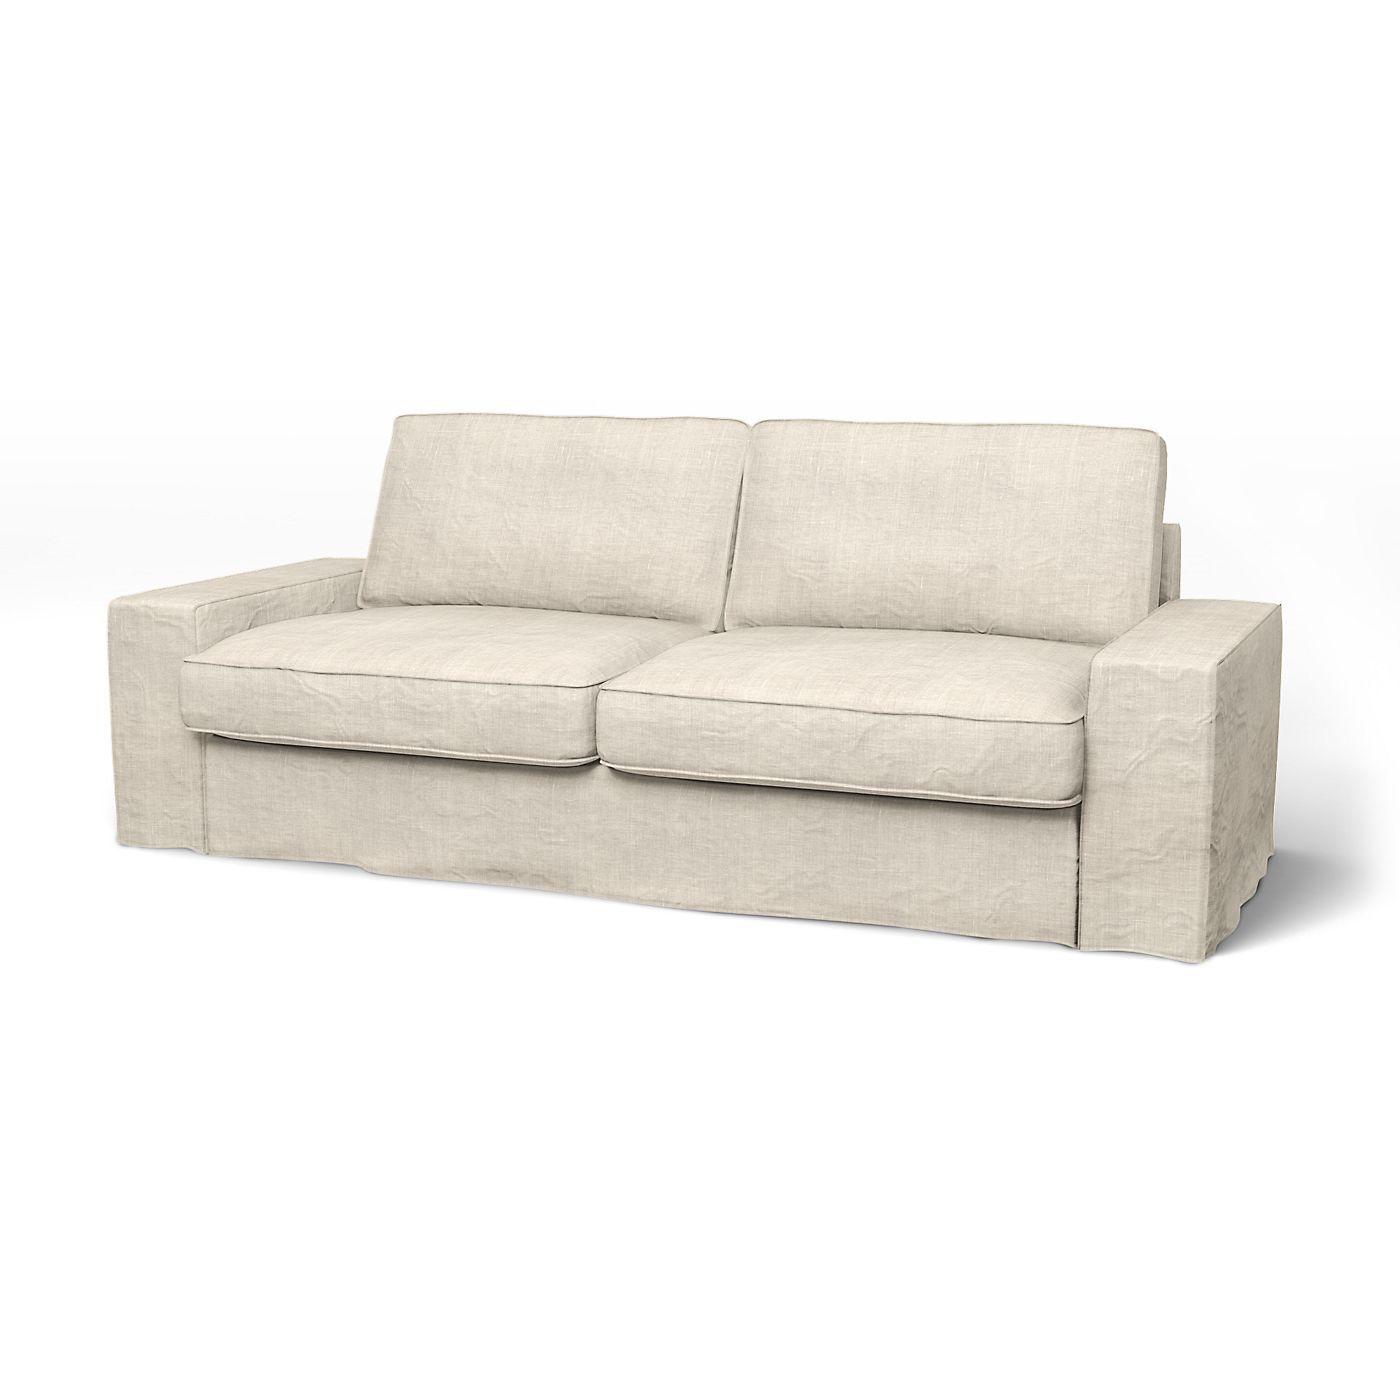 cotton loose sofa covers cheap set malaysia kivik 3 seater cover fit urban pinterest